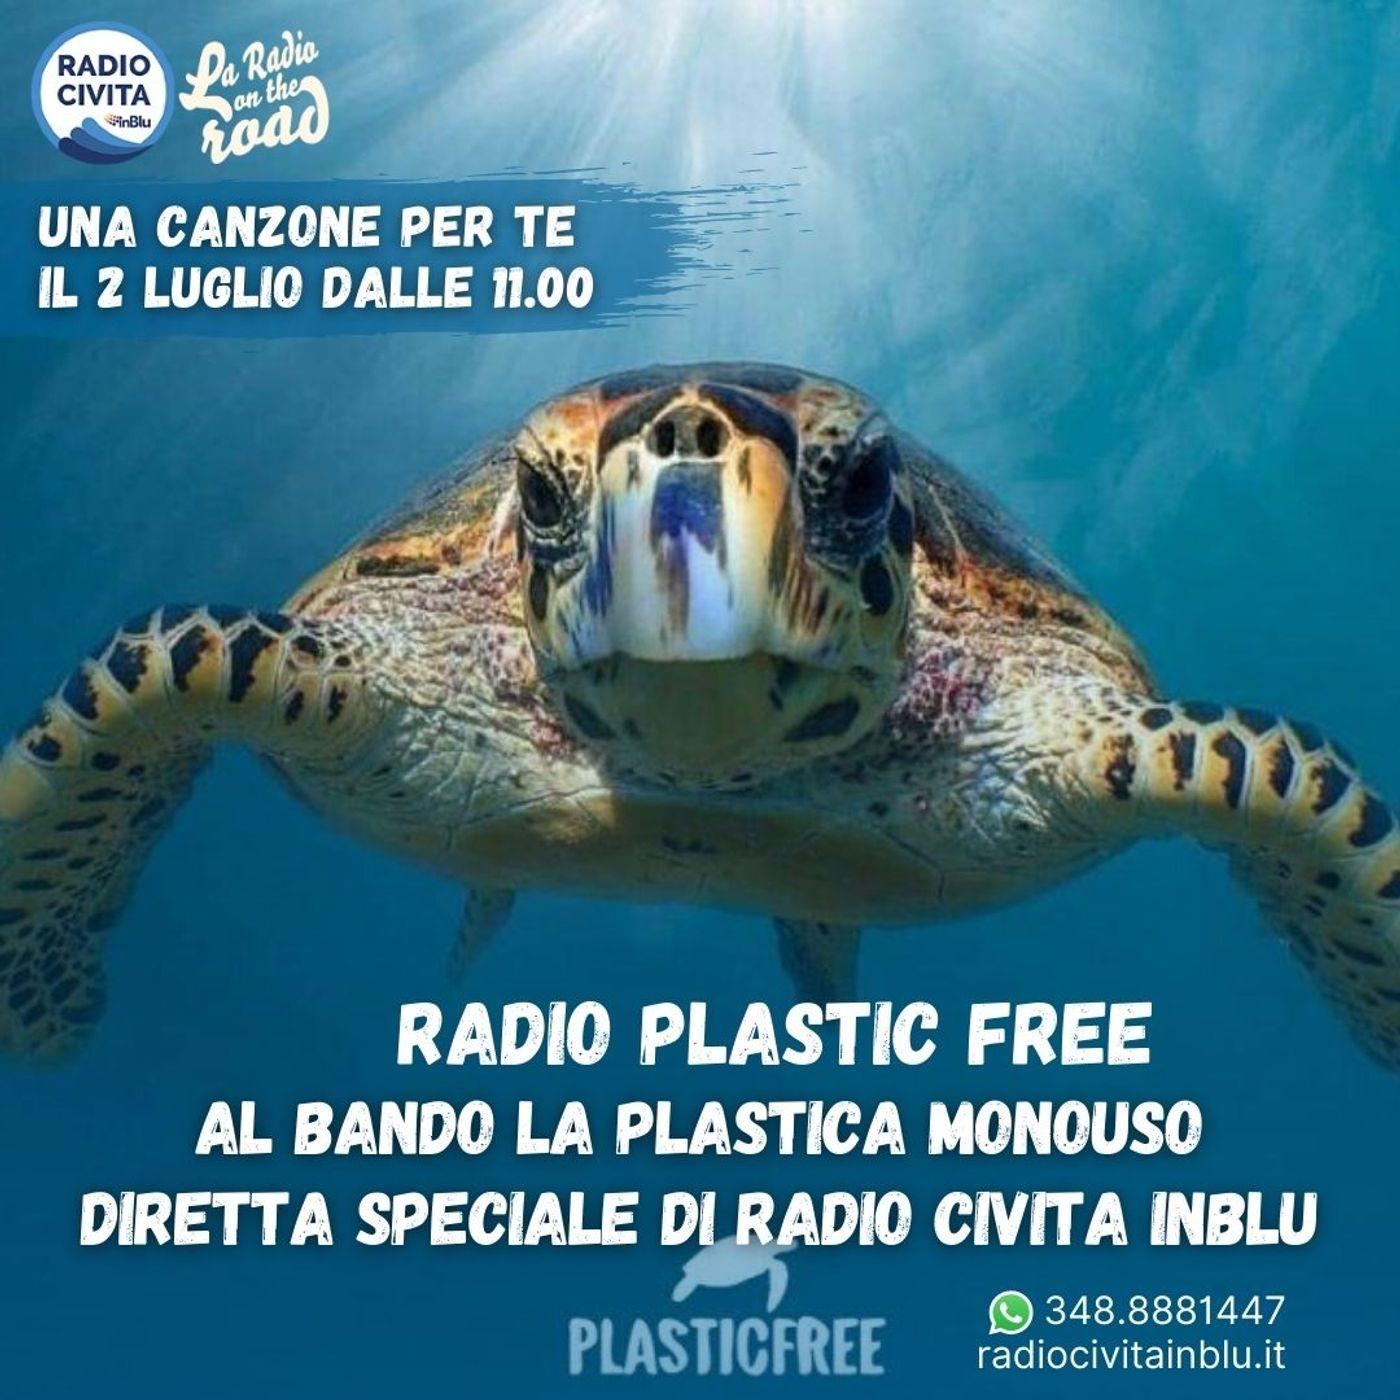 Radio Plastic Free, Al bando la plastica monouso